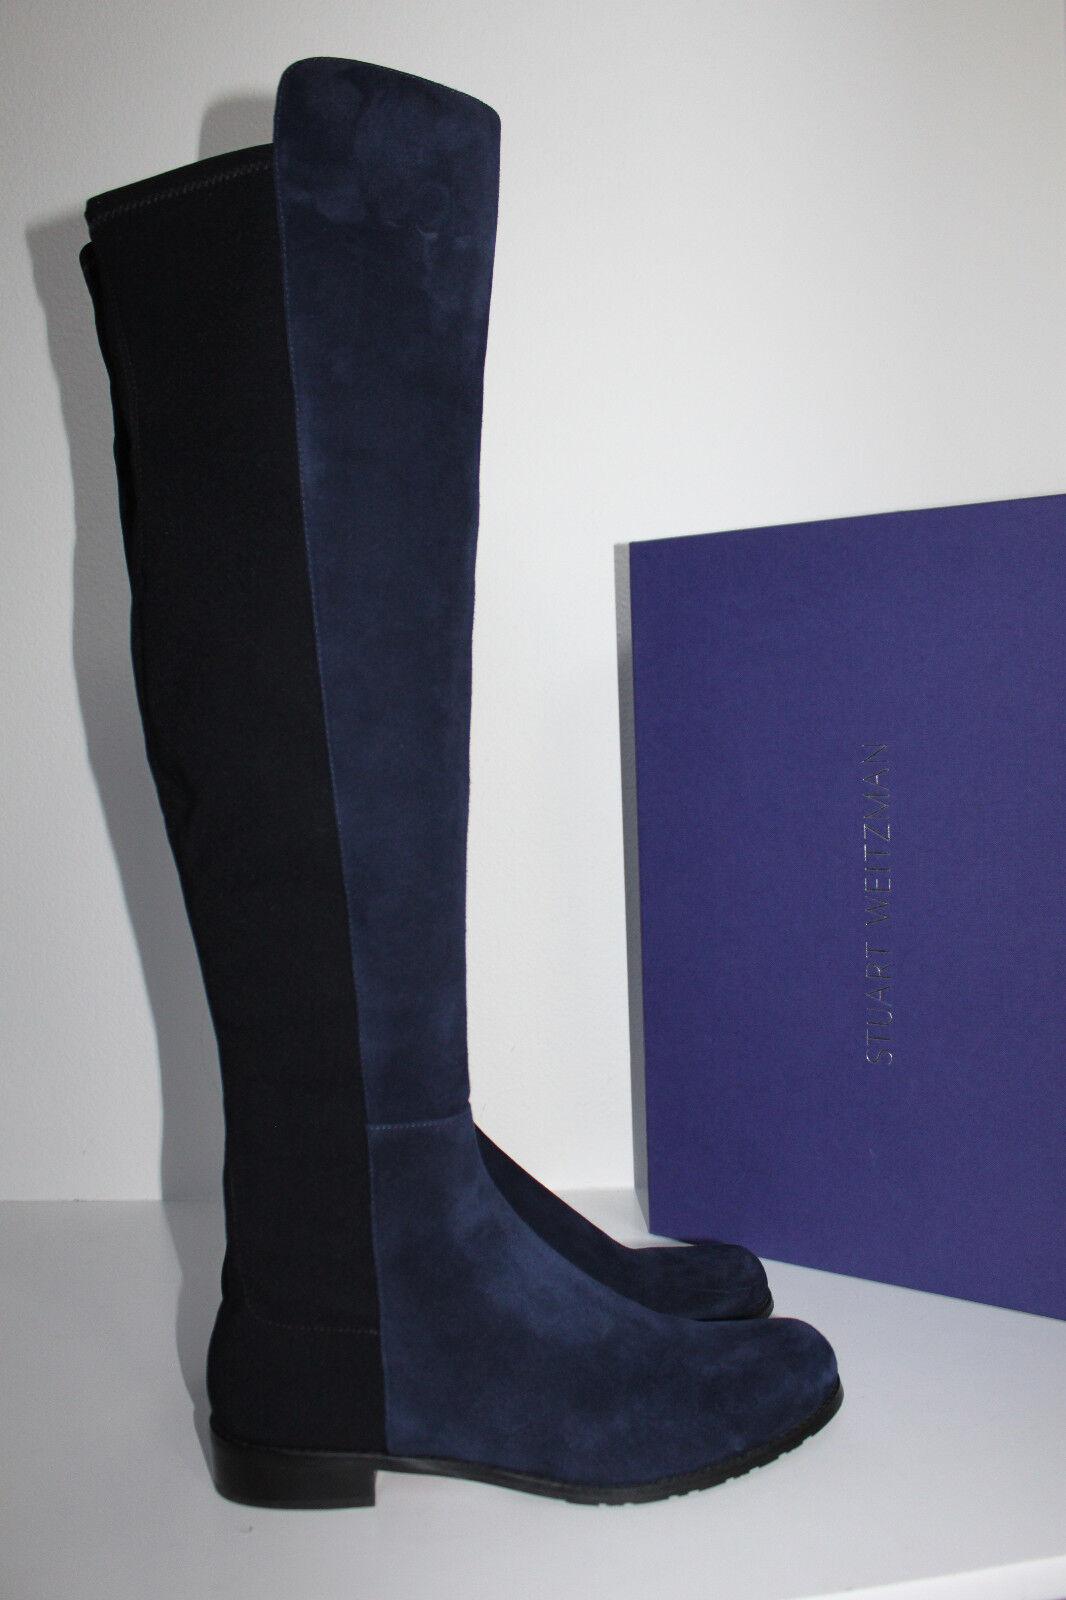 New sz 9.5 M Stuart Weitzman 5050 Navy azul Suede Over the Knee bota zapatos